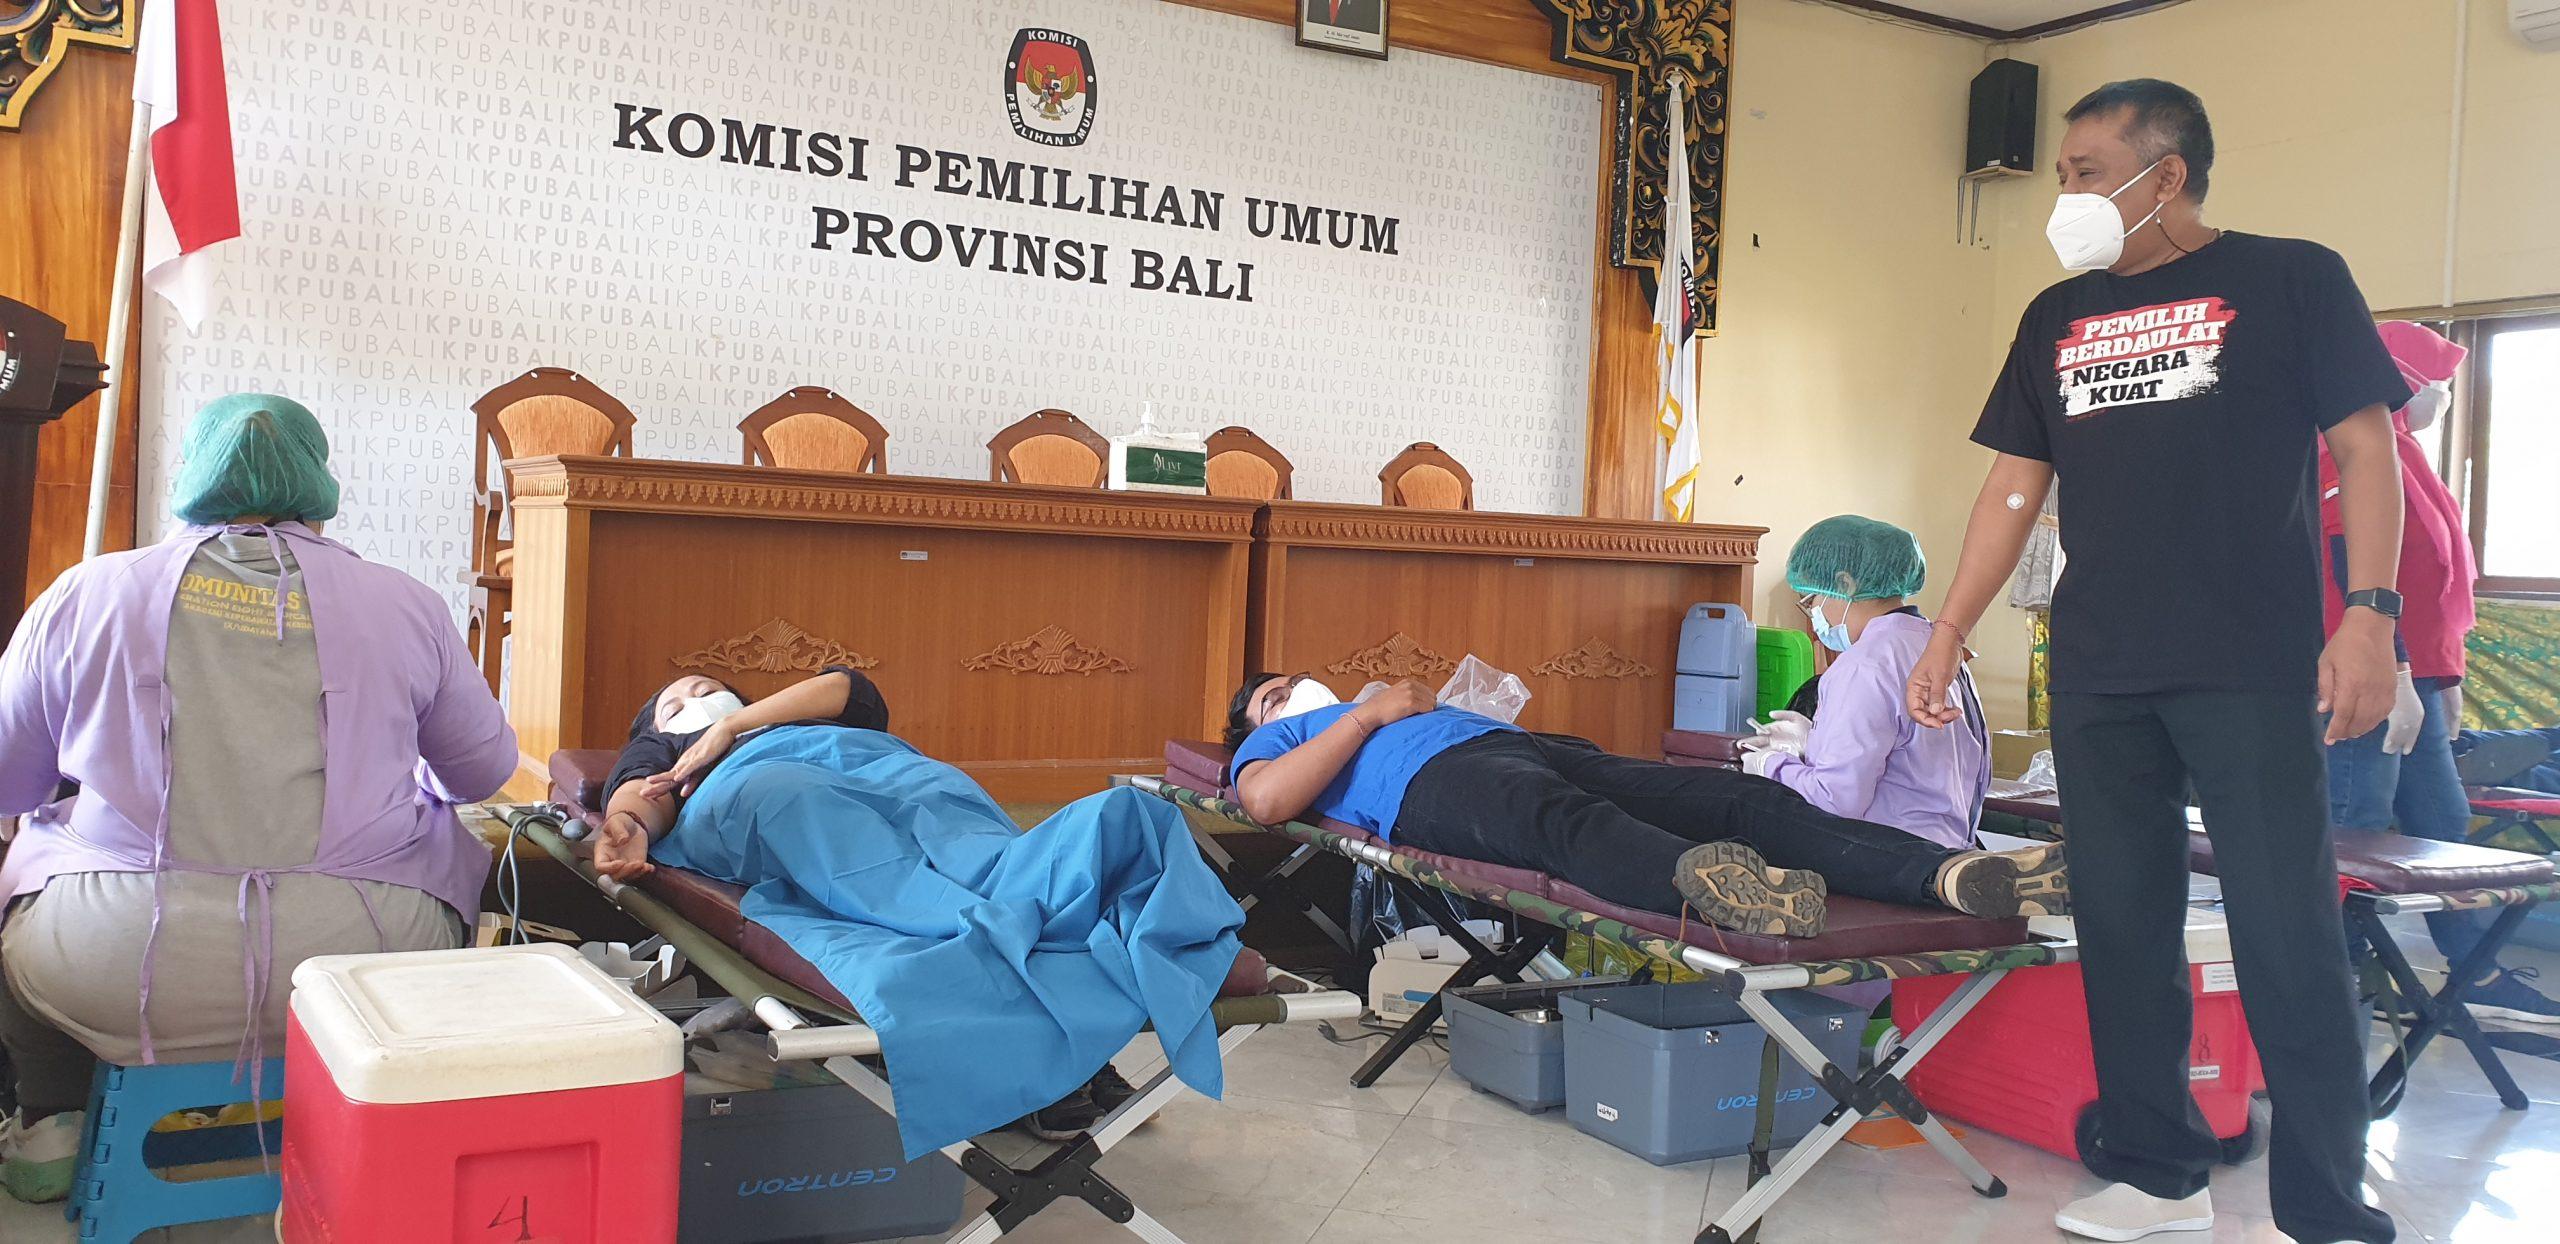 KETUA KPU Bali, I Dewa Agung Gede Lidartawan, memantau proses donor darah di KPU Bali, Rabu (25/8/2021). Foto: hen